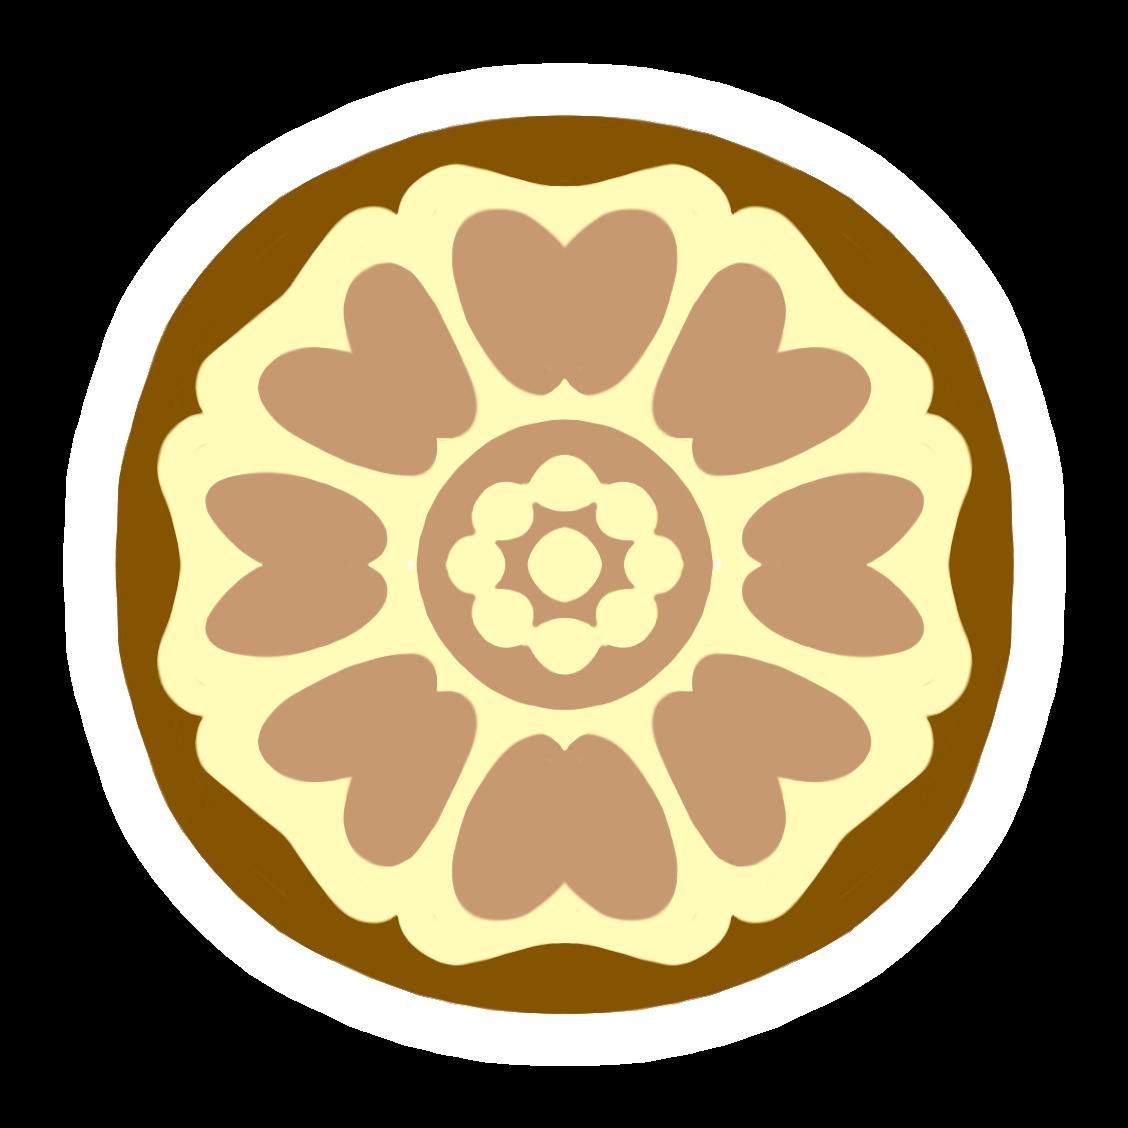 Avatar White Lotus Pai Sho Tile Sticker In 2021 White Lotus Tattoo White Lotus Avatar